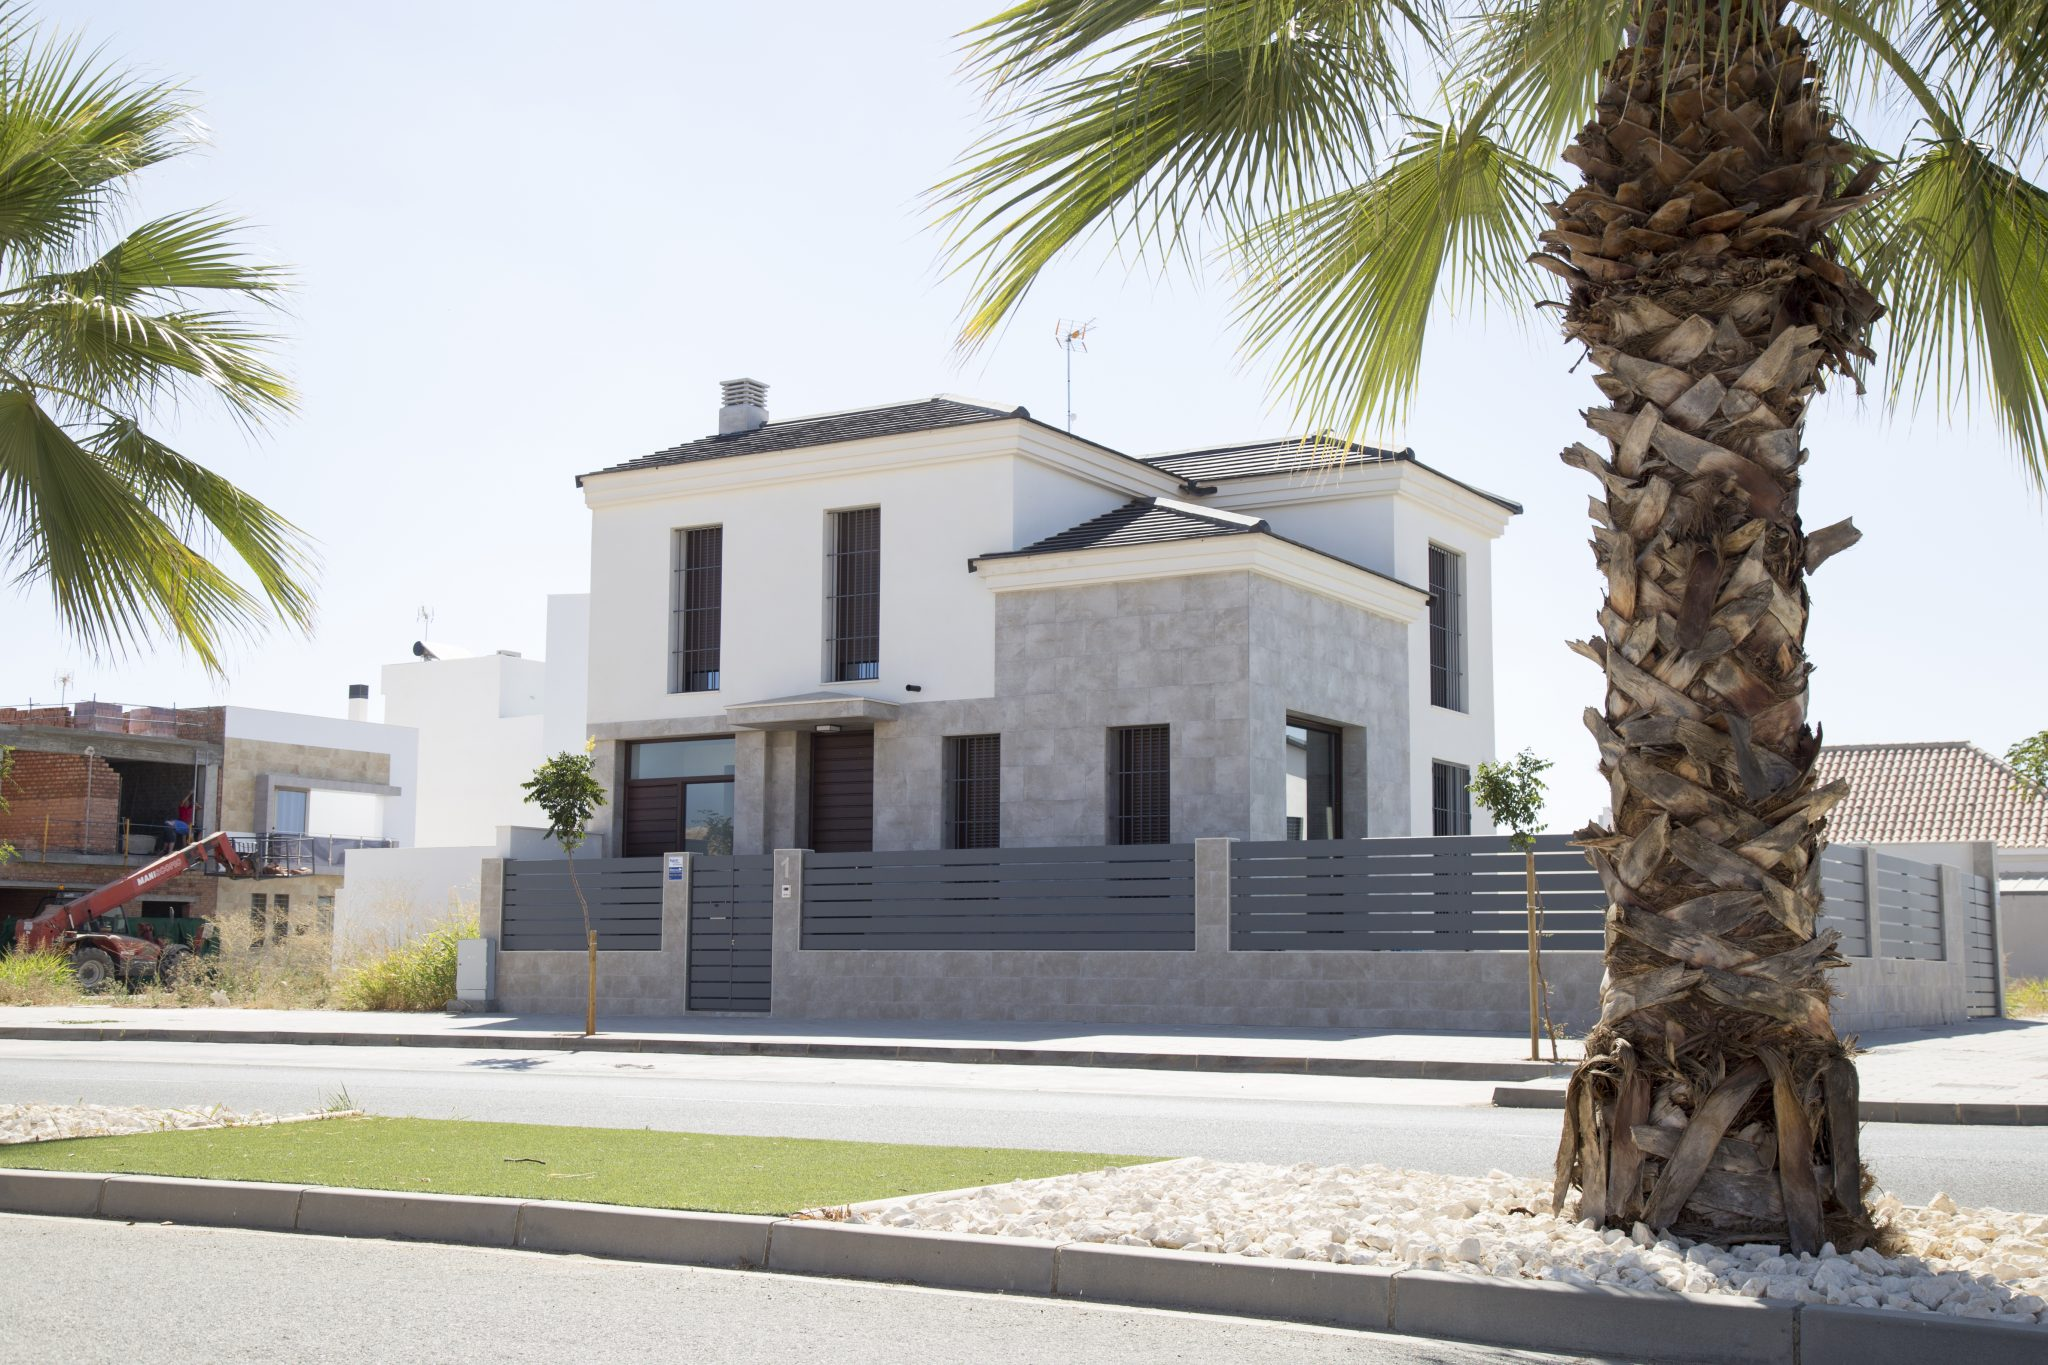 vivienda pareada en la vega del Guadalquivir